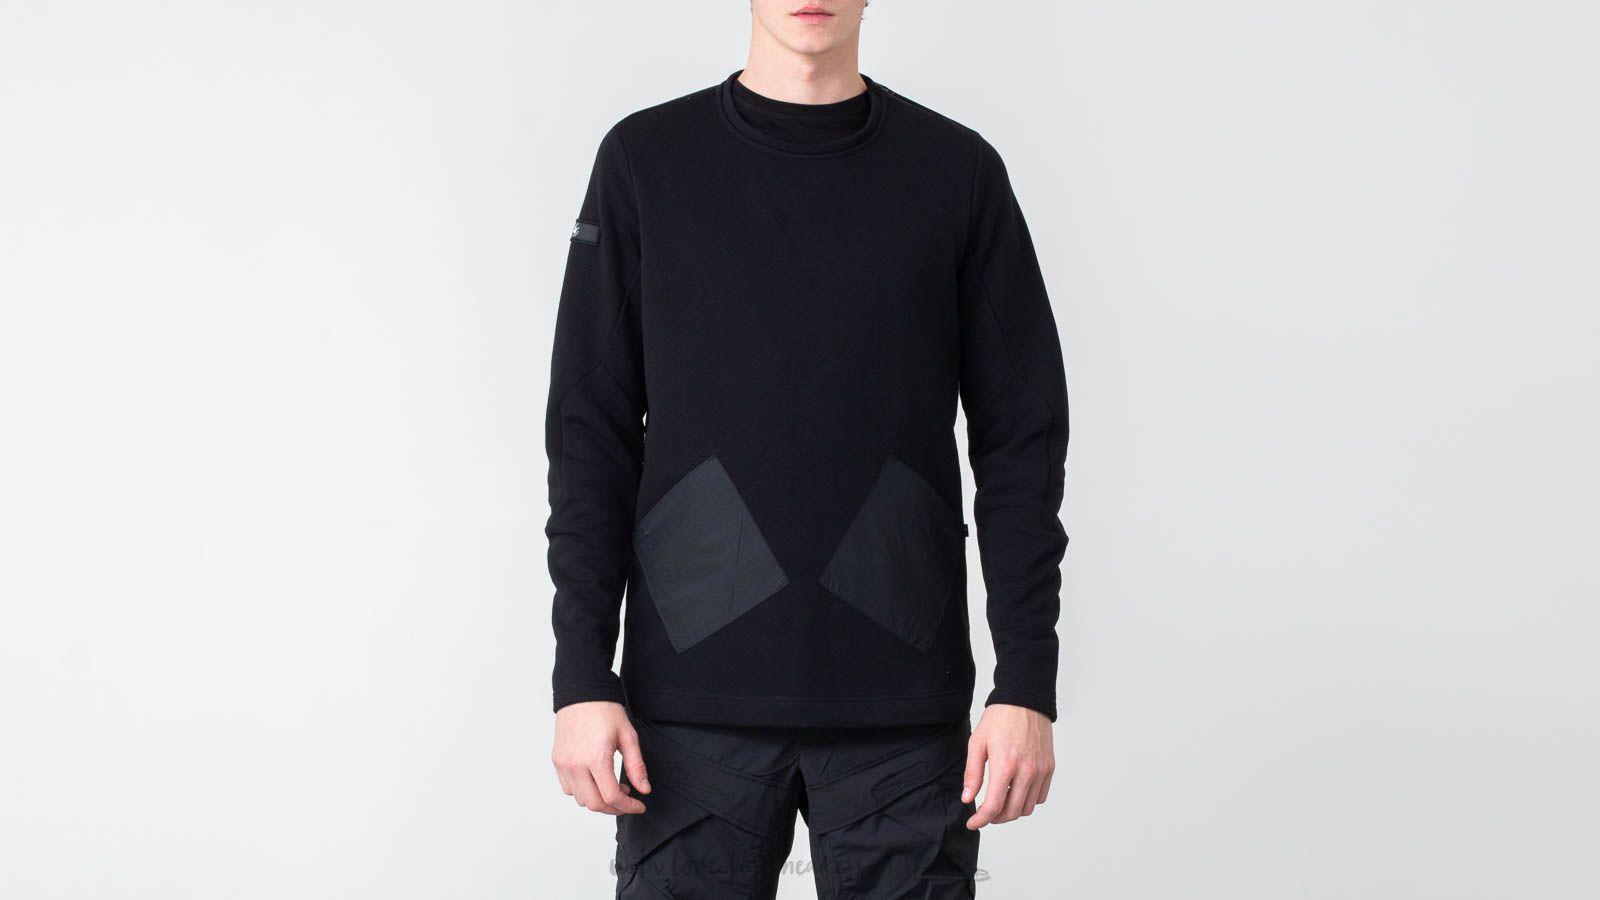 Riot Division 2 Pockets Sweatshirt